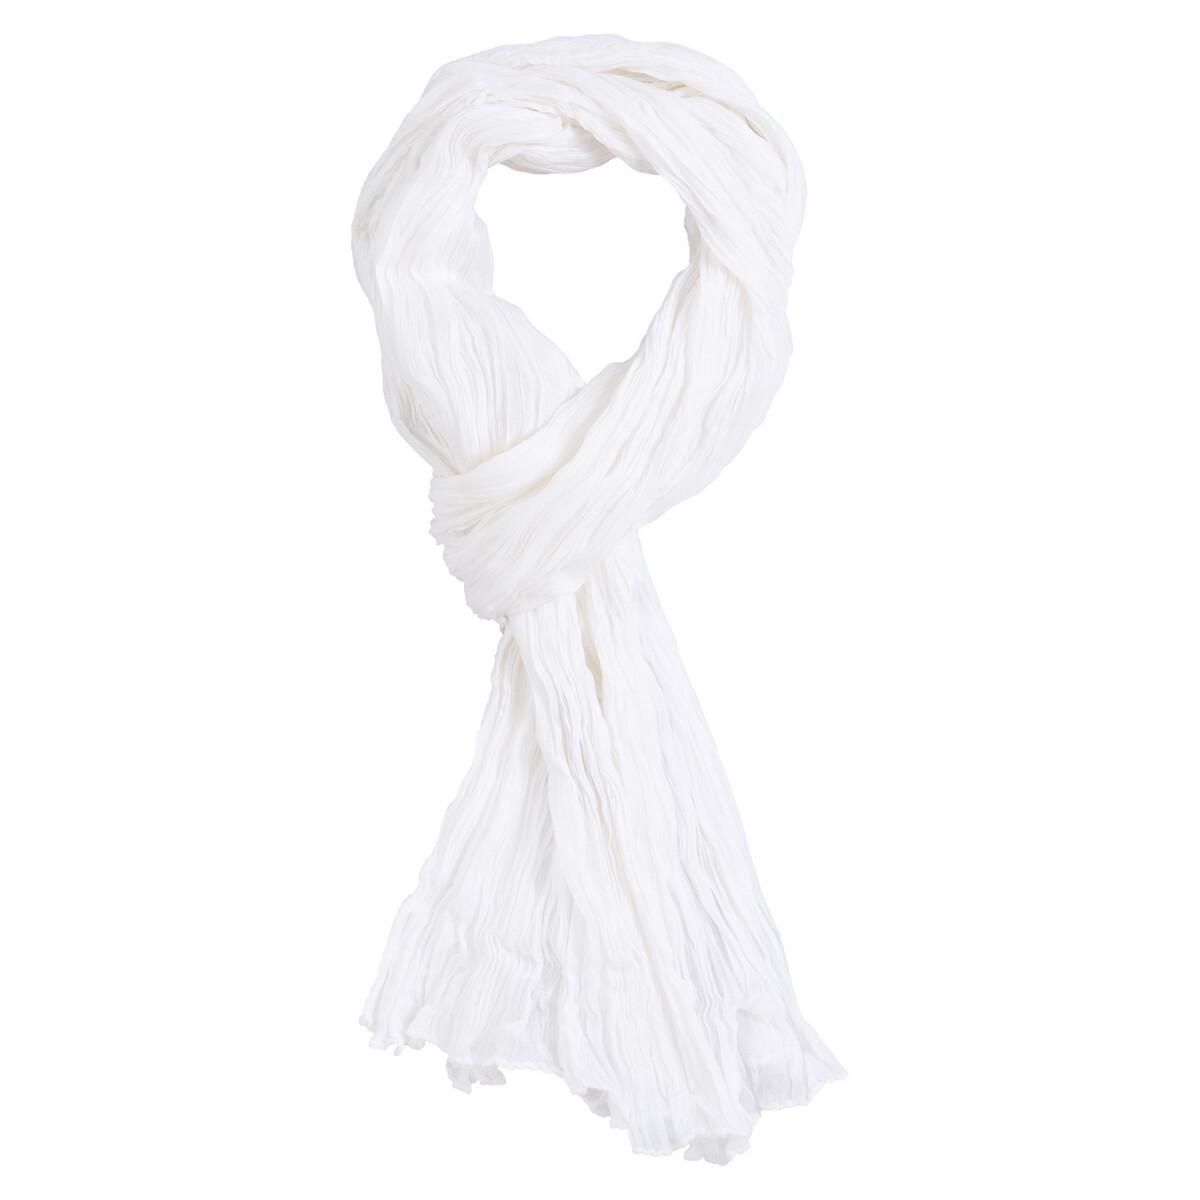 Fular liso 100% algodón